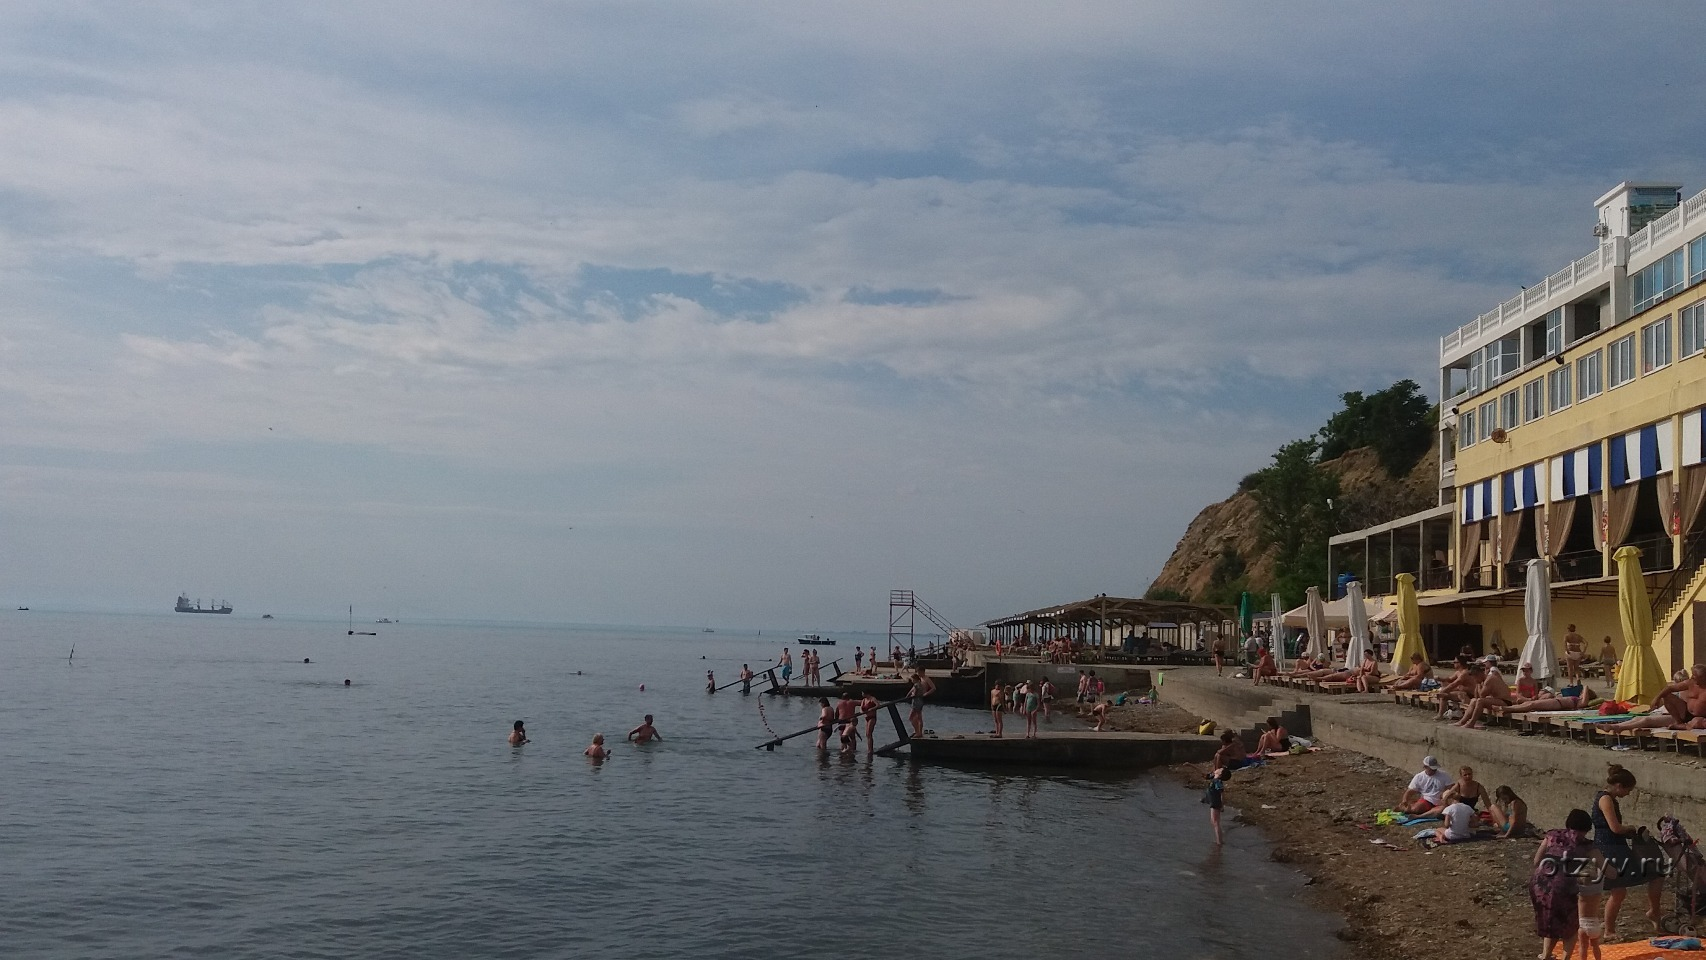 Малая бухта фото пляжа